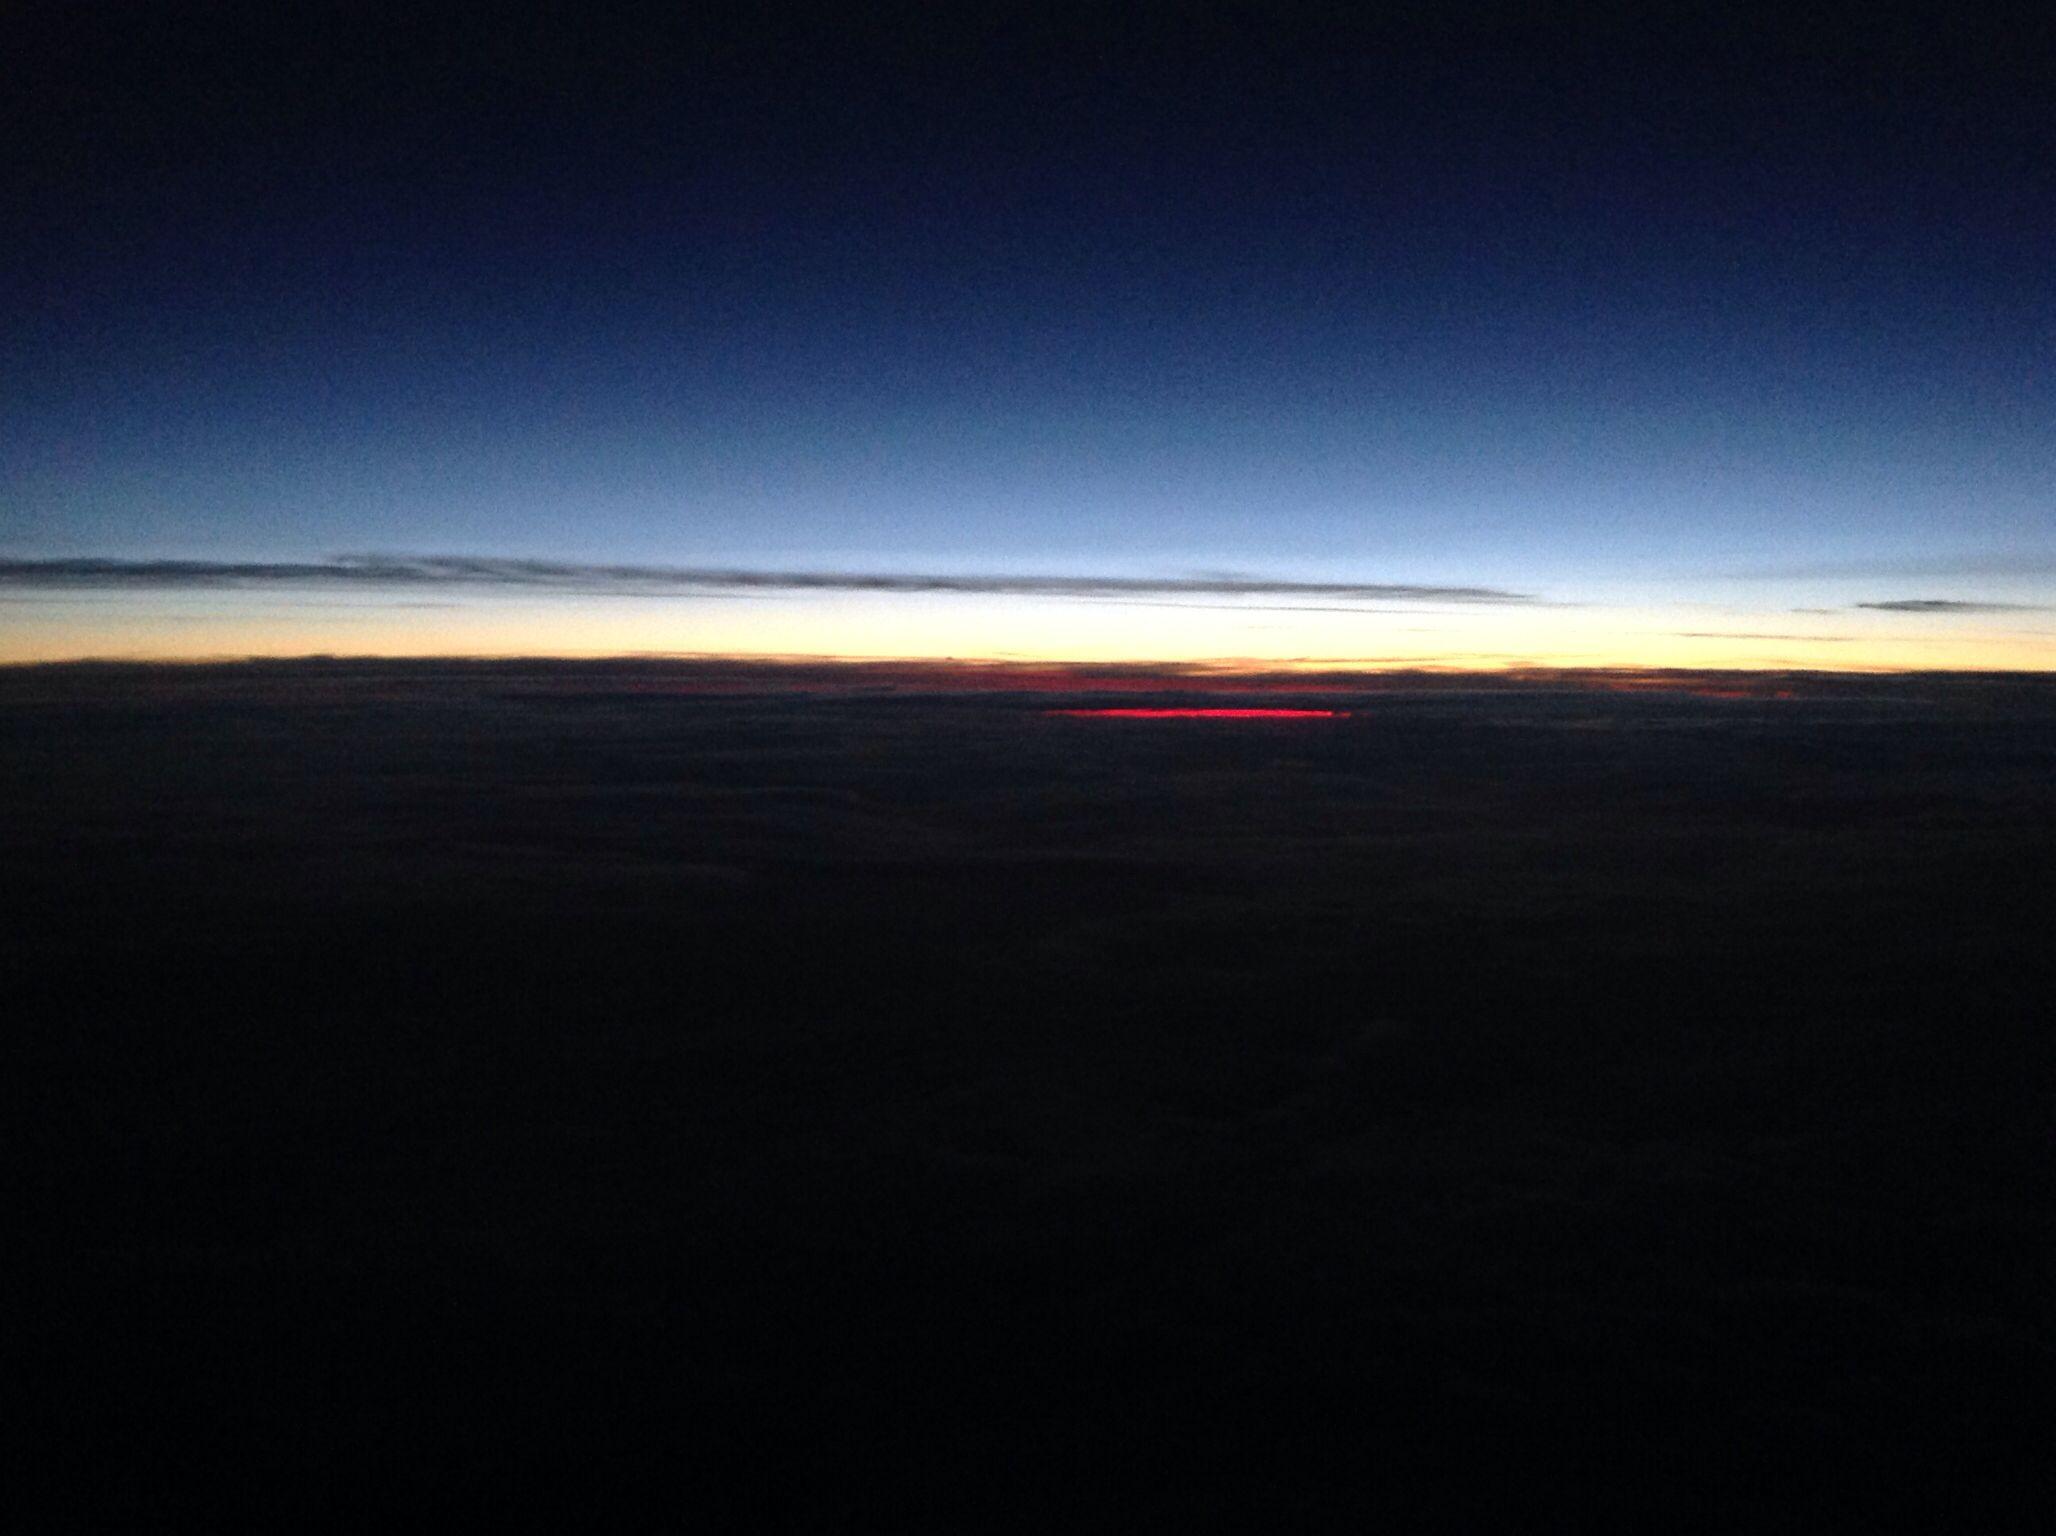 The sun setting at 30,000 feet.